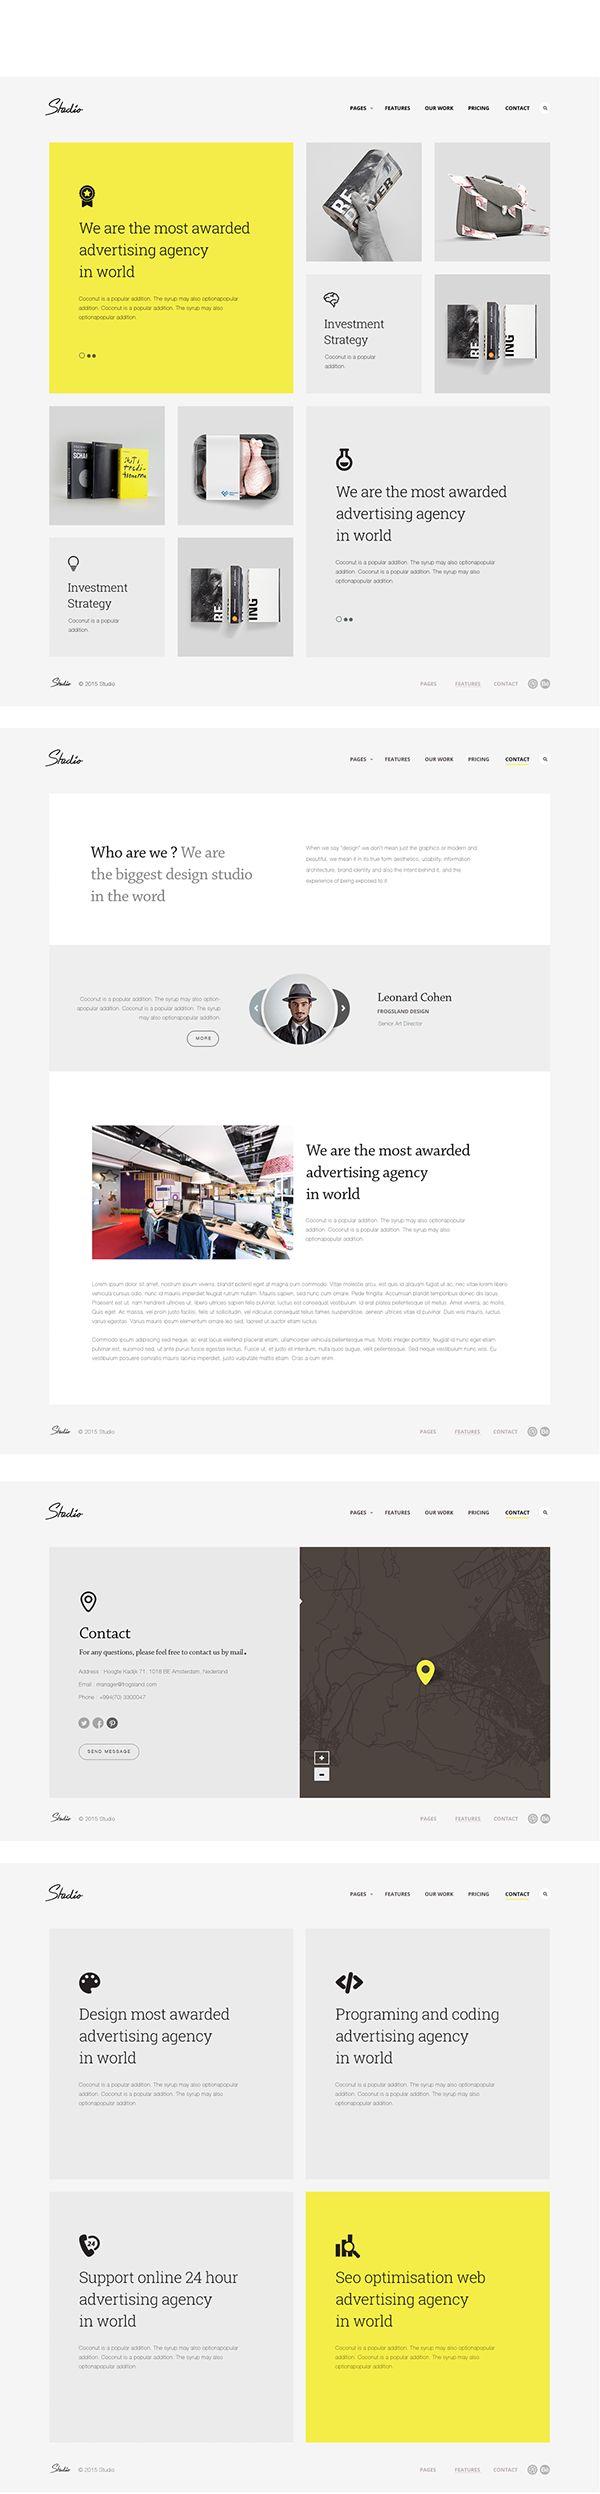 Studio Template [HTML5] on Web Design Served